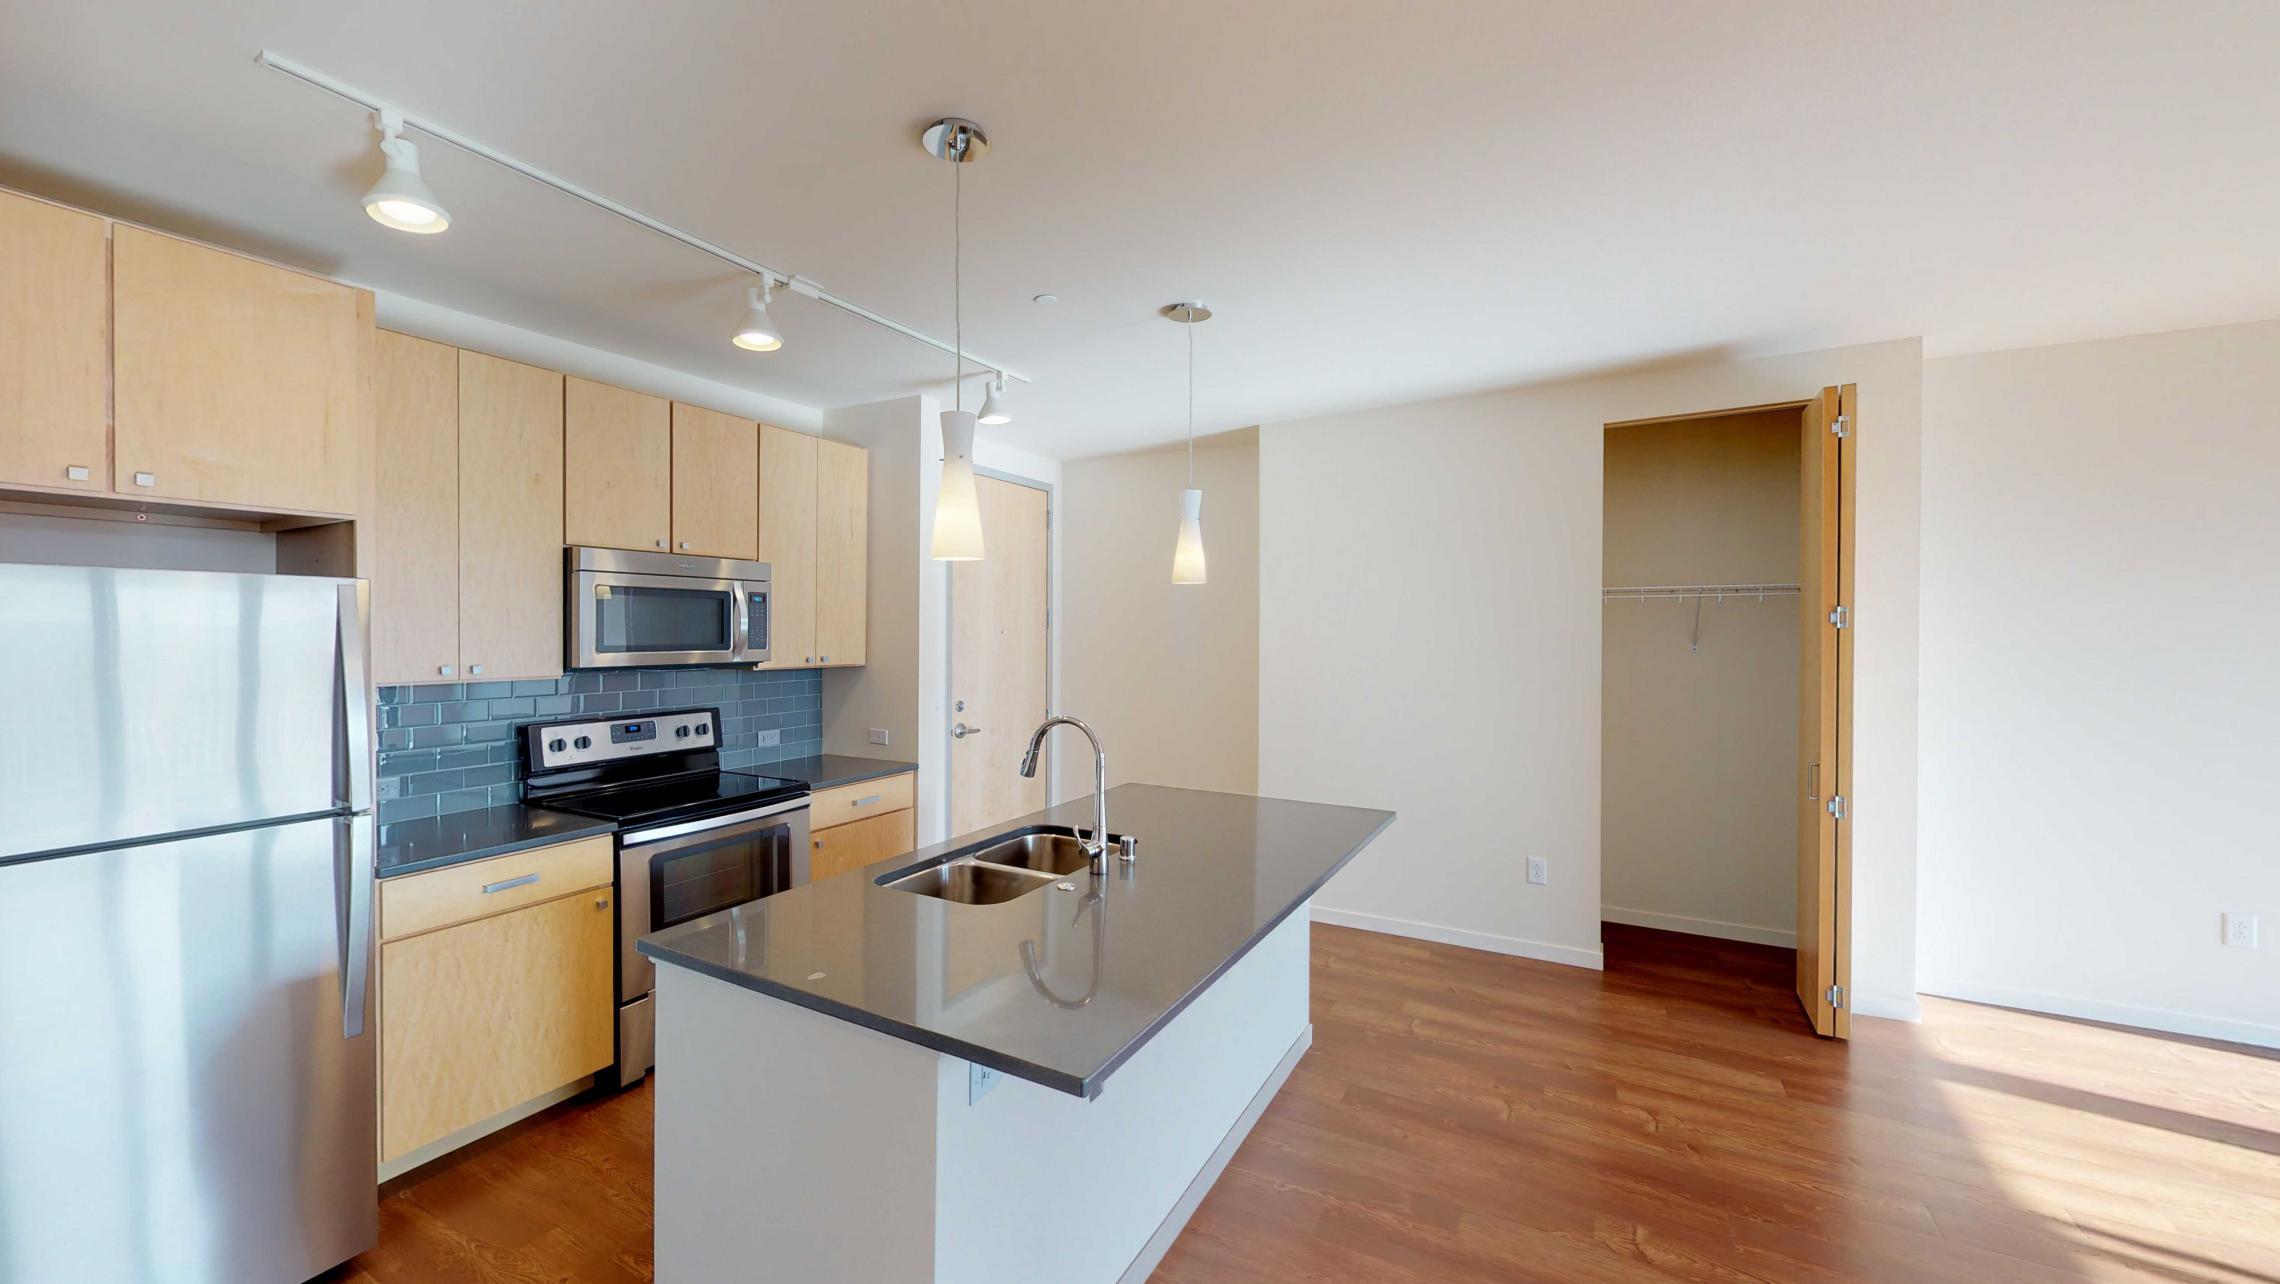 Nine-Line-Apartment-520-kitchen-upscale-modern-luxury-design-madison-lifestyle-balcony-downtown-capitol.jpg